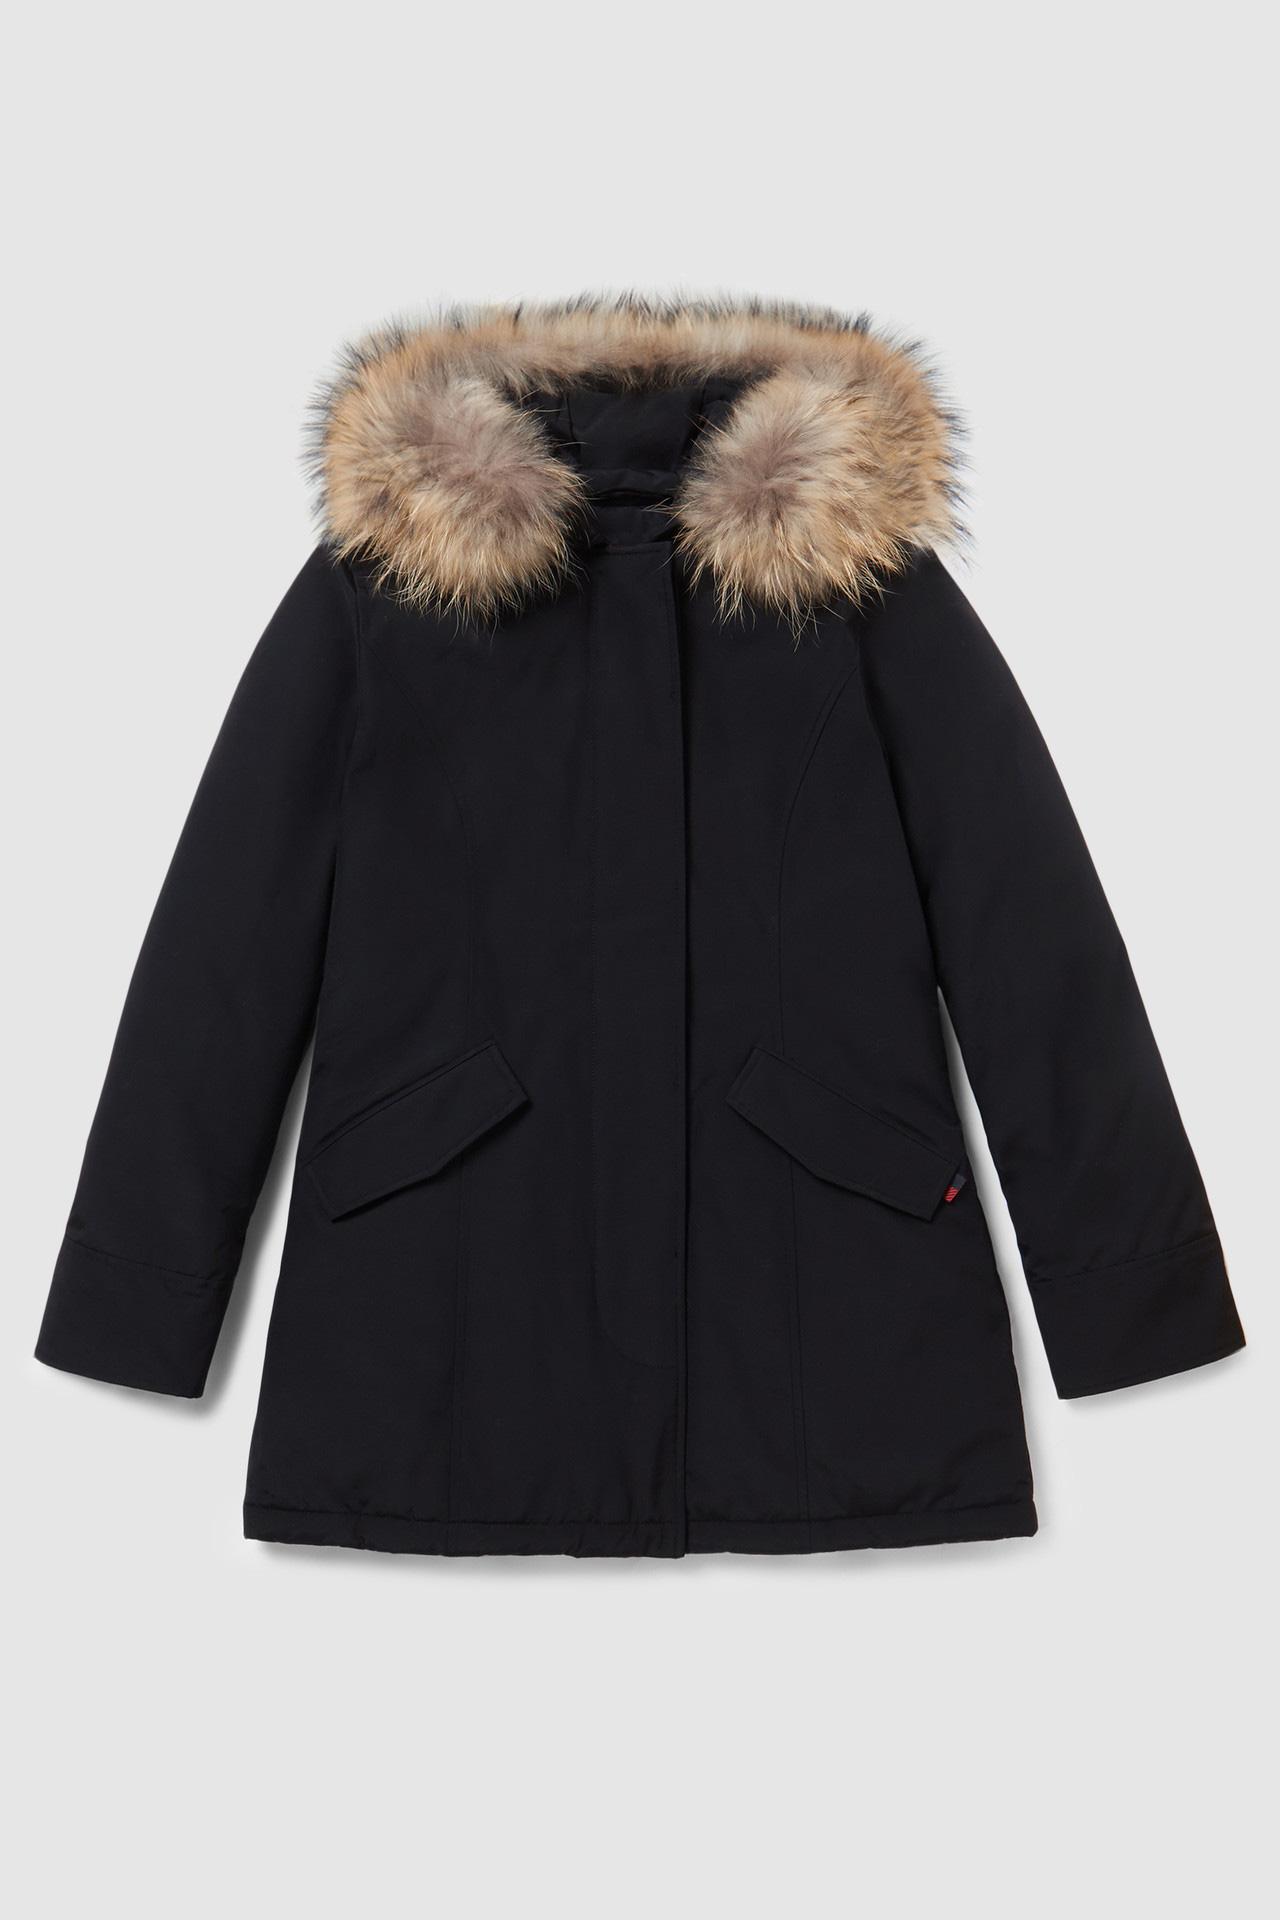 Woolrich Arctic Parka pelliccia racoon nero